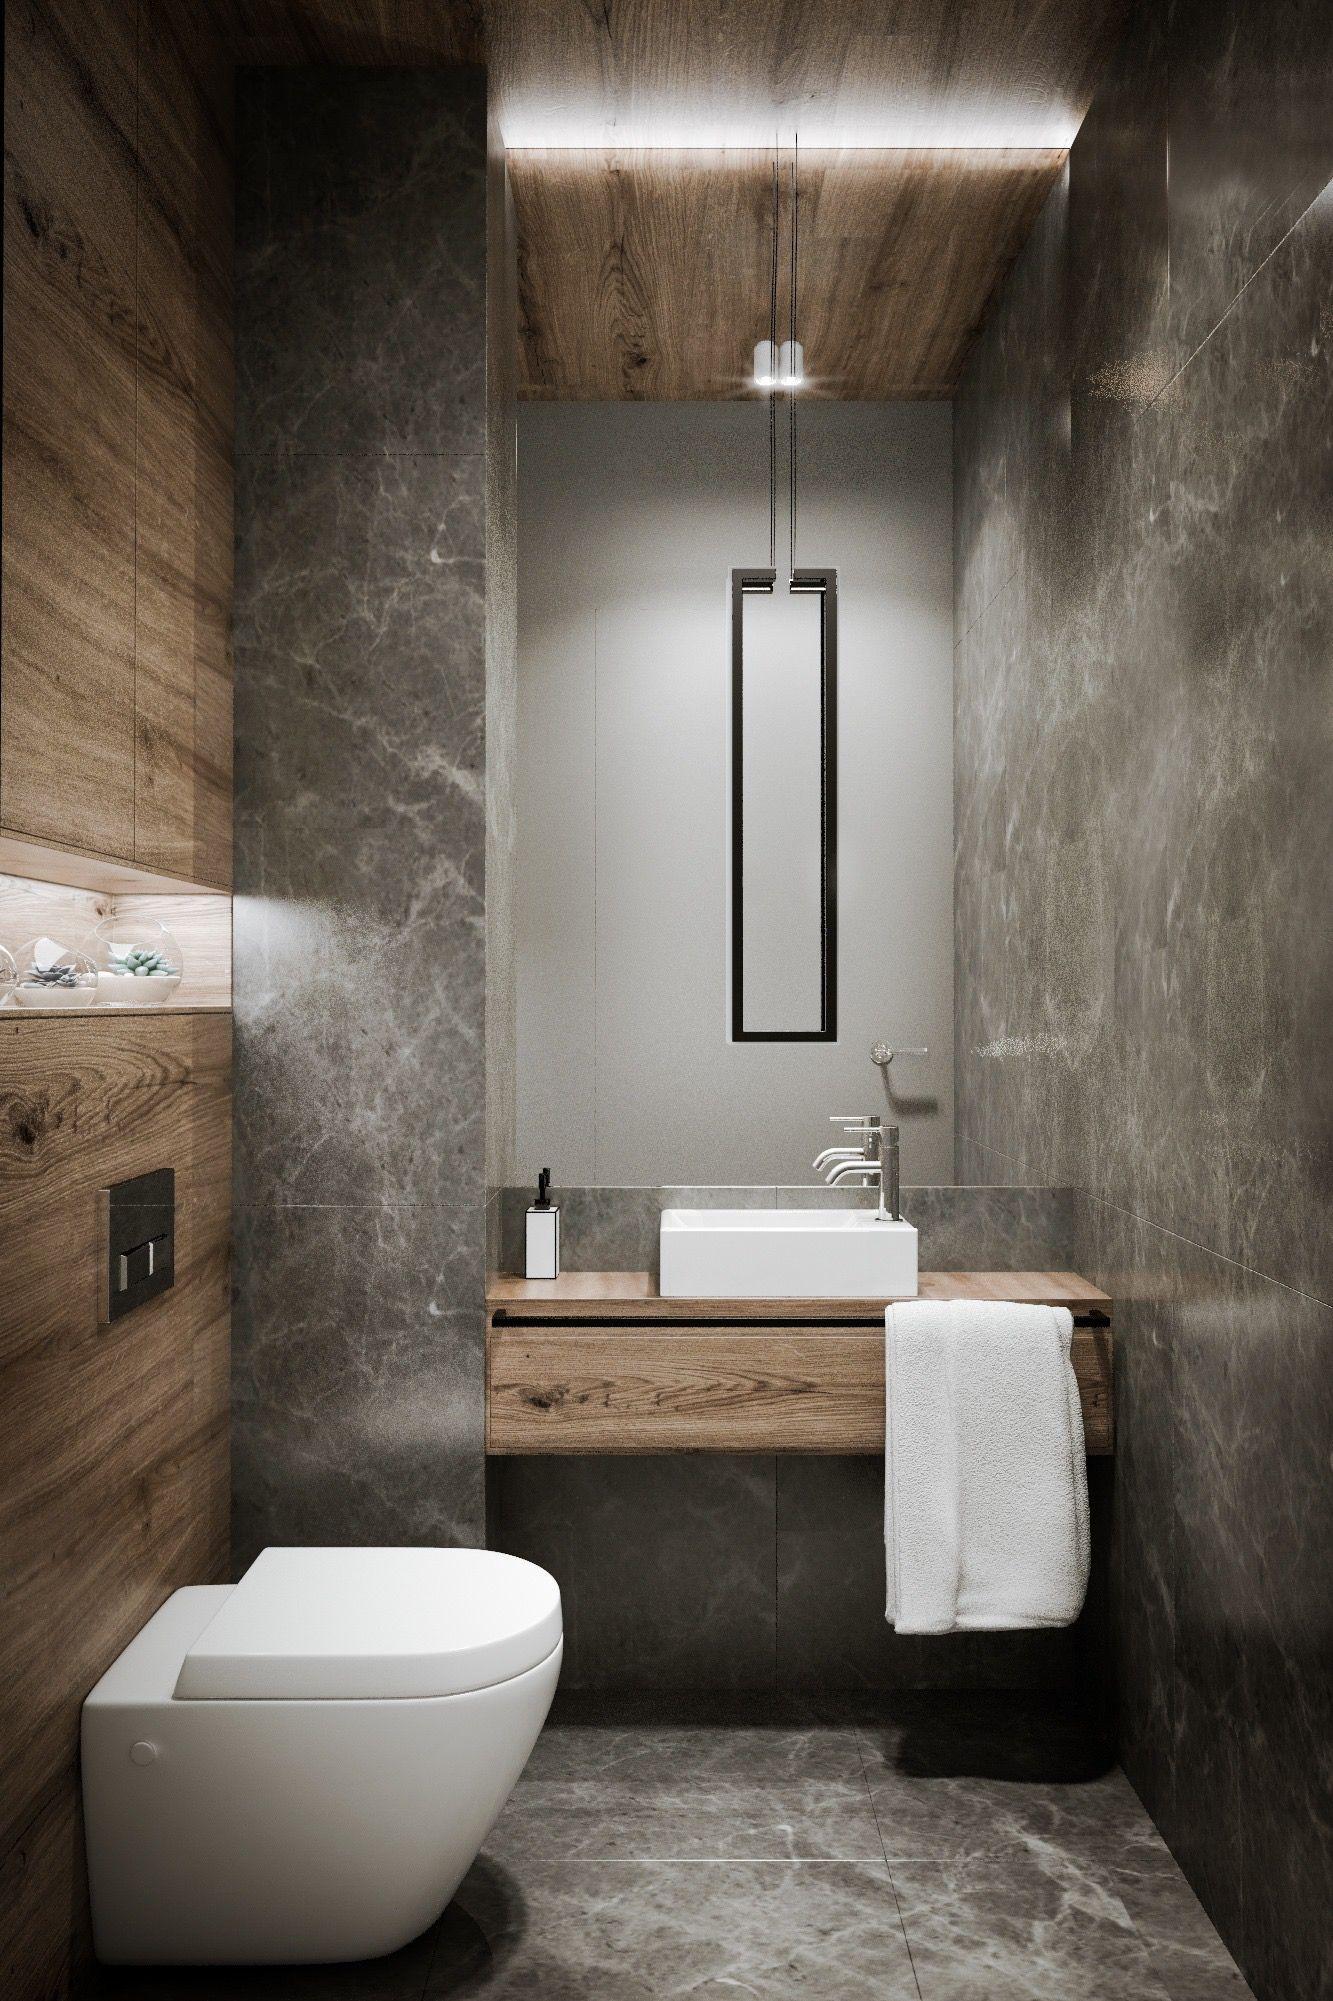 salle de bains moderne effet b ton cir avec vasque carr e. Black Bedroom Furniture Sets. Home Design Ideas